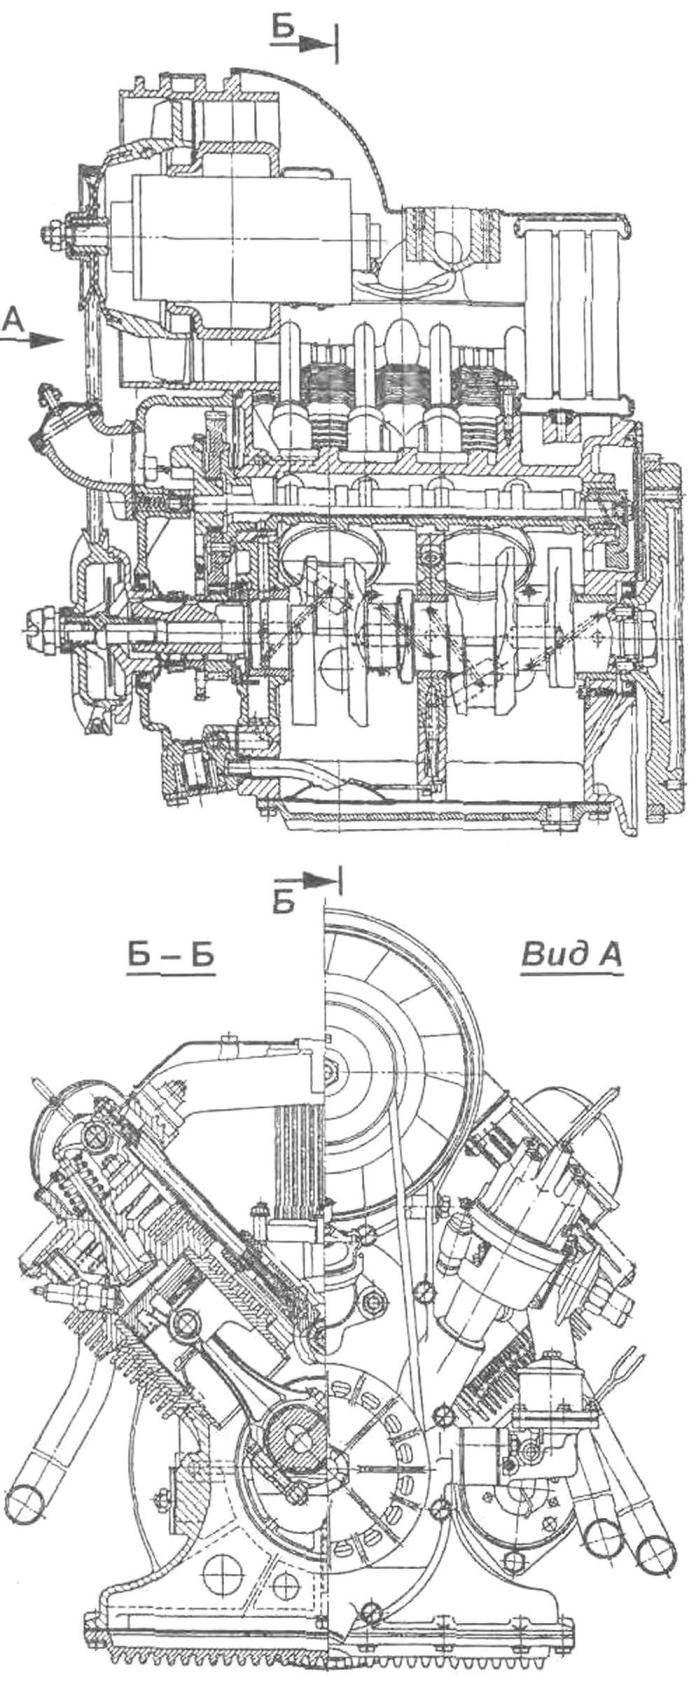 МеМЗ-966—двигатель автомобиля ЗАЗ-965А «Запорожец»